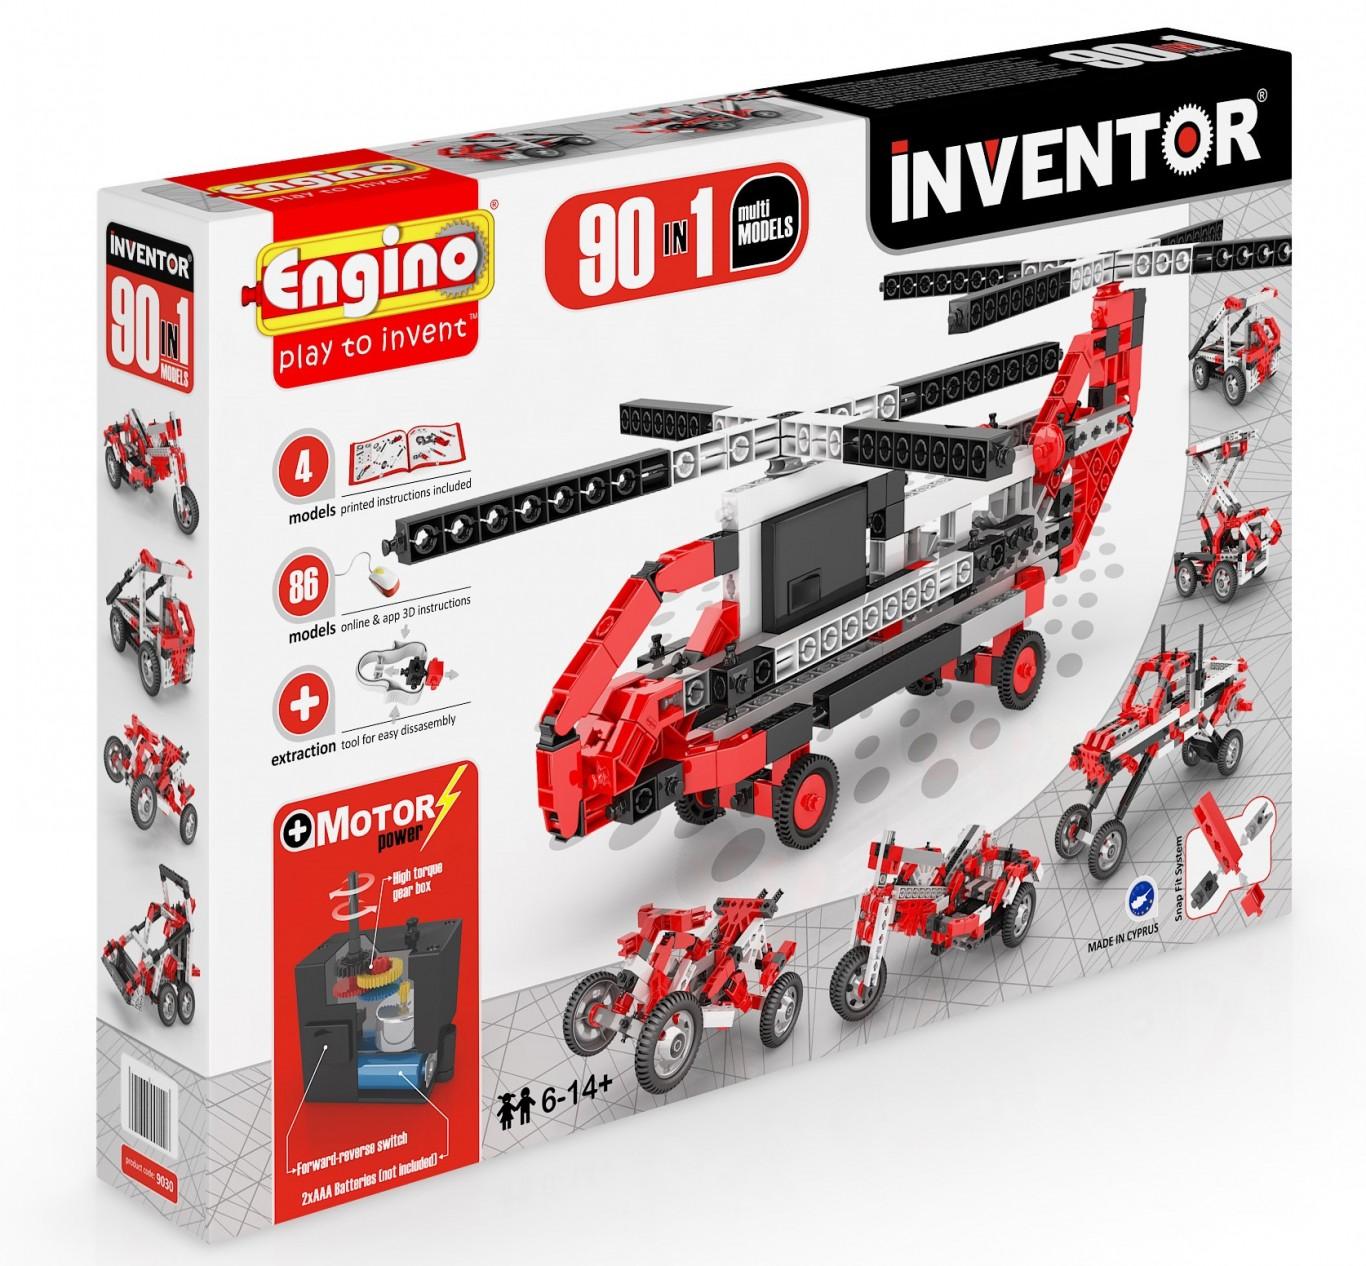 Stavebnice Engino 9030 Inventor 90 Modelů motorizovaný set